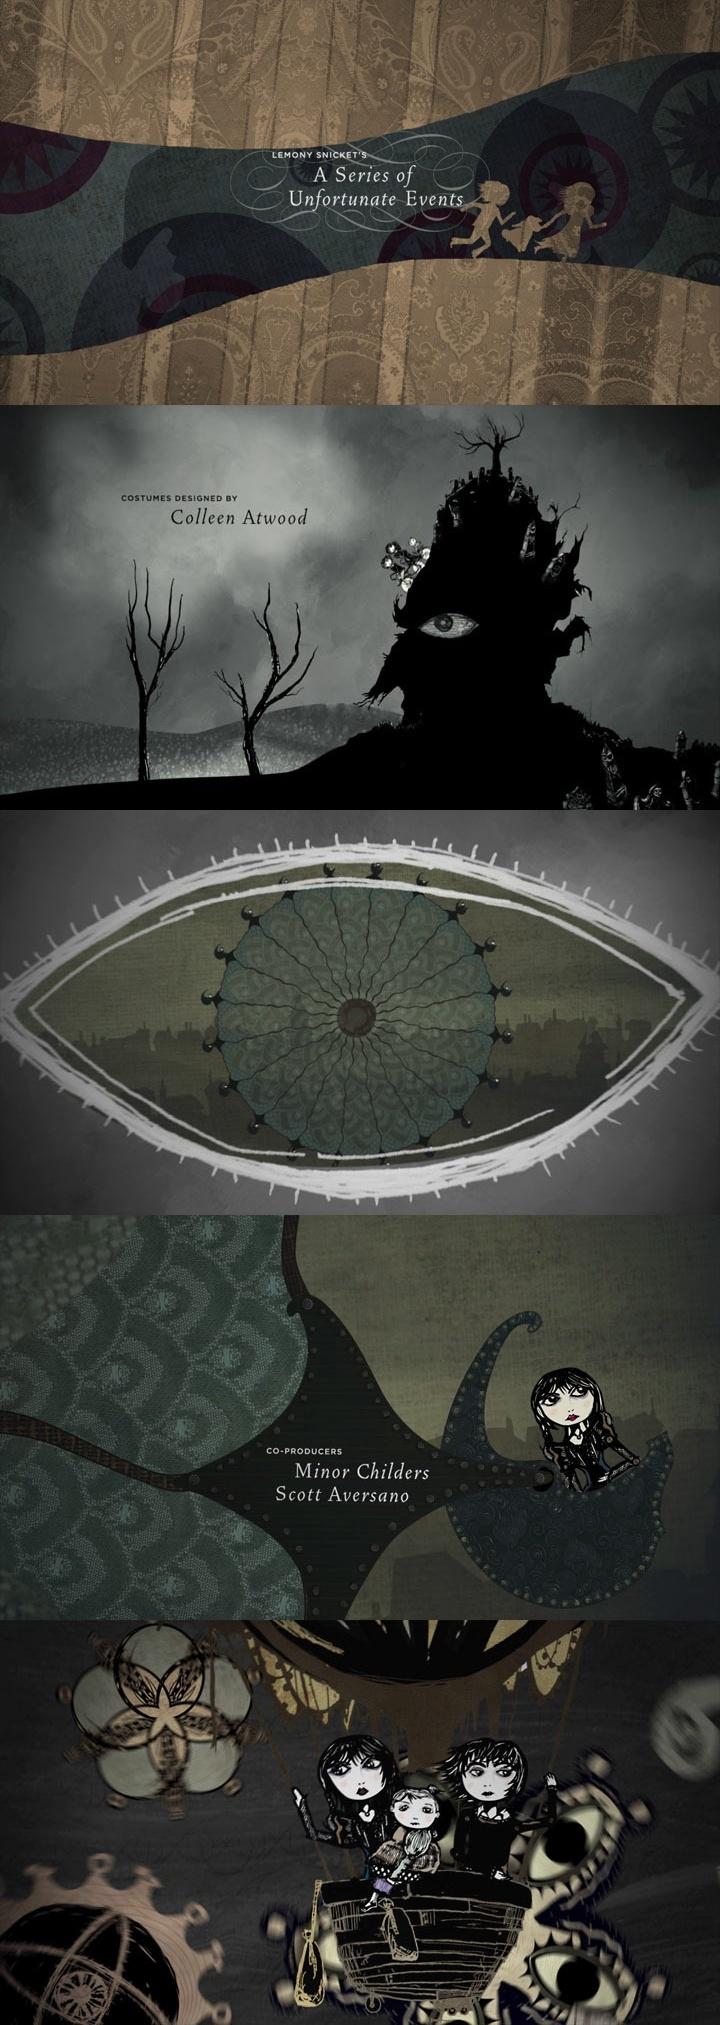 Lemony Snicket's A Series Of Unfortunate Events  End Credits  Designer:  Jamie Caliri